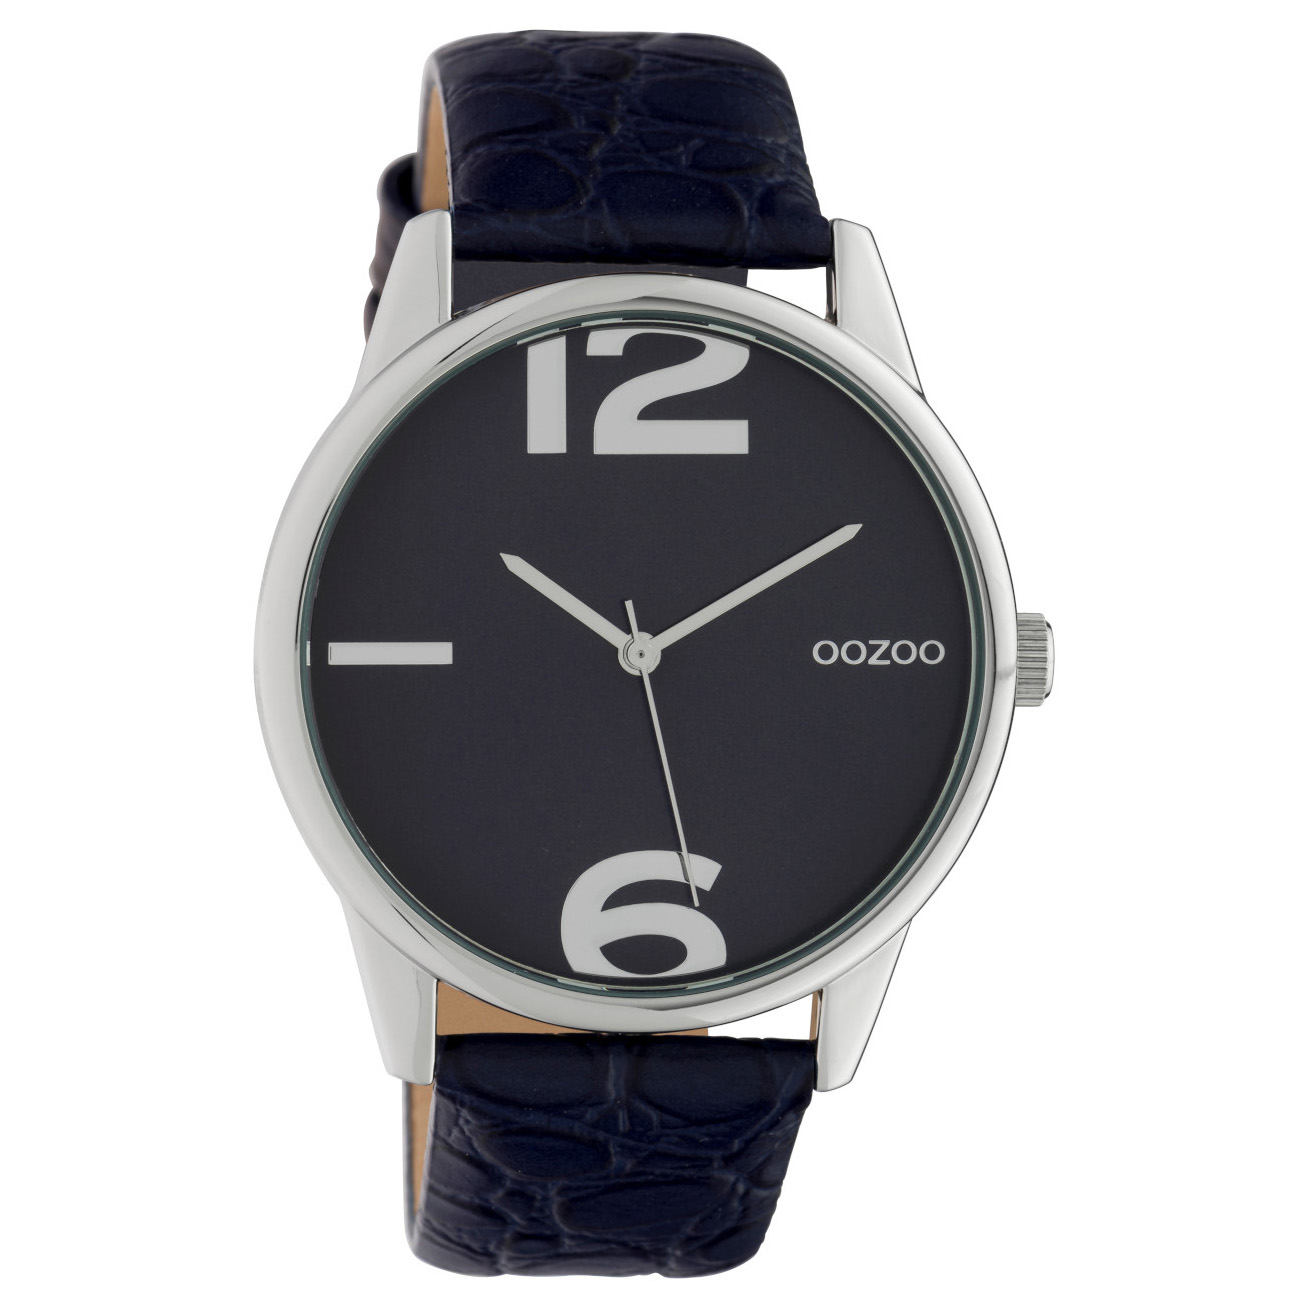 OOZOO C10377 Horloge Timepiece Collection Evening Blue Croco 45 mm